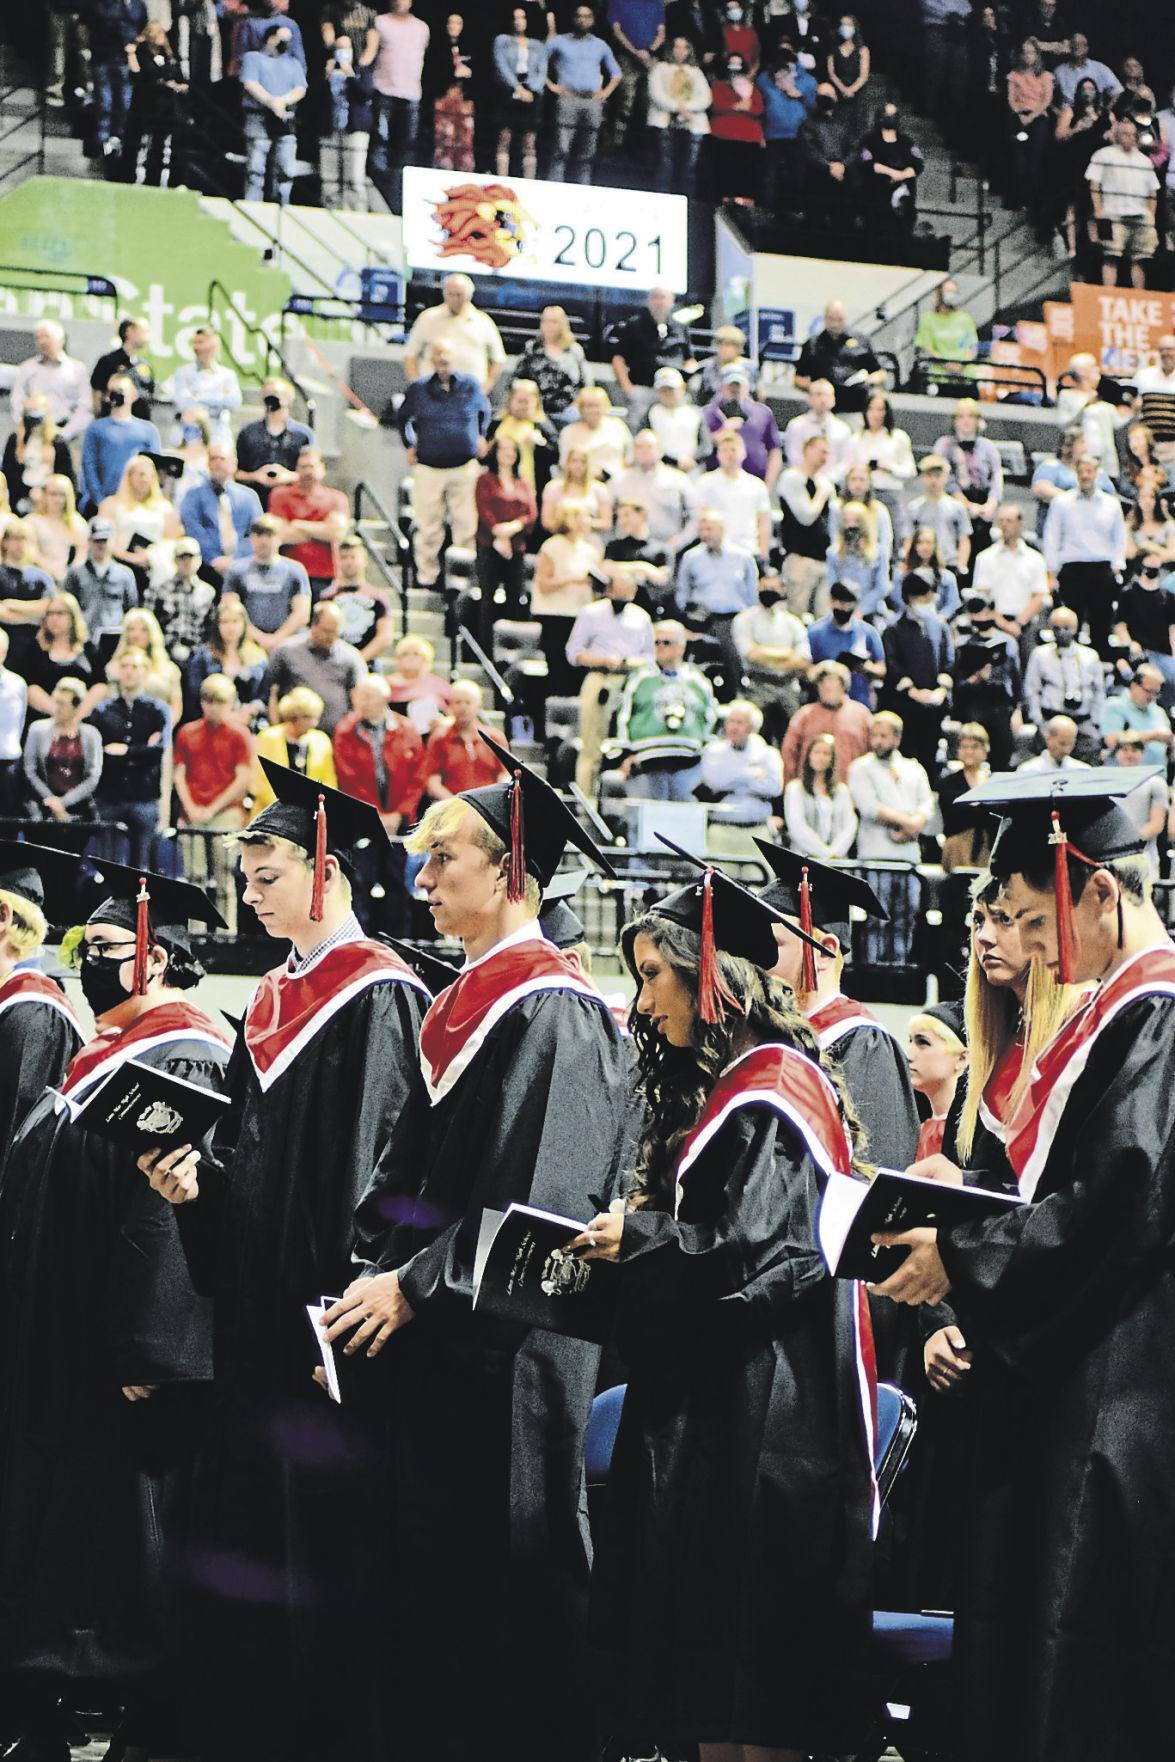 Linn Mar graduation 2